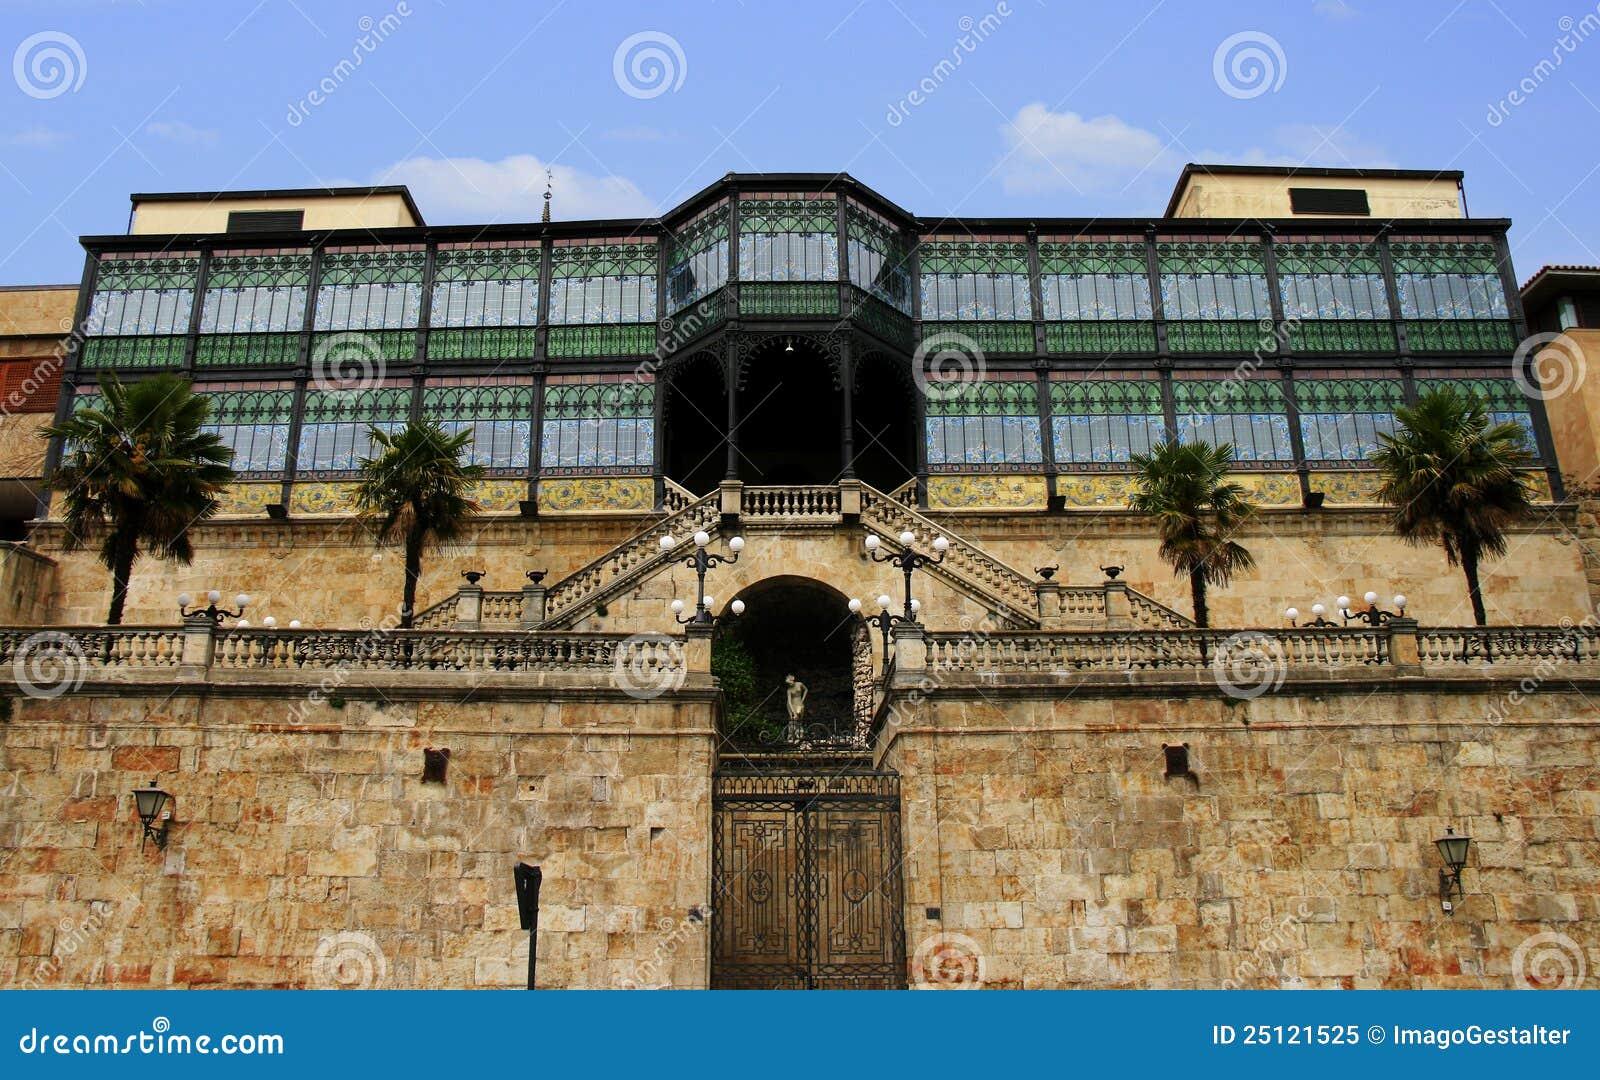 Casa lis art nouveau museum salamanca royalty free stock - La casa lis de salamanca ...